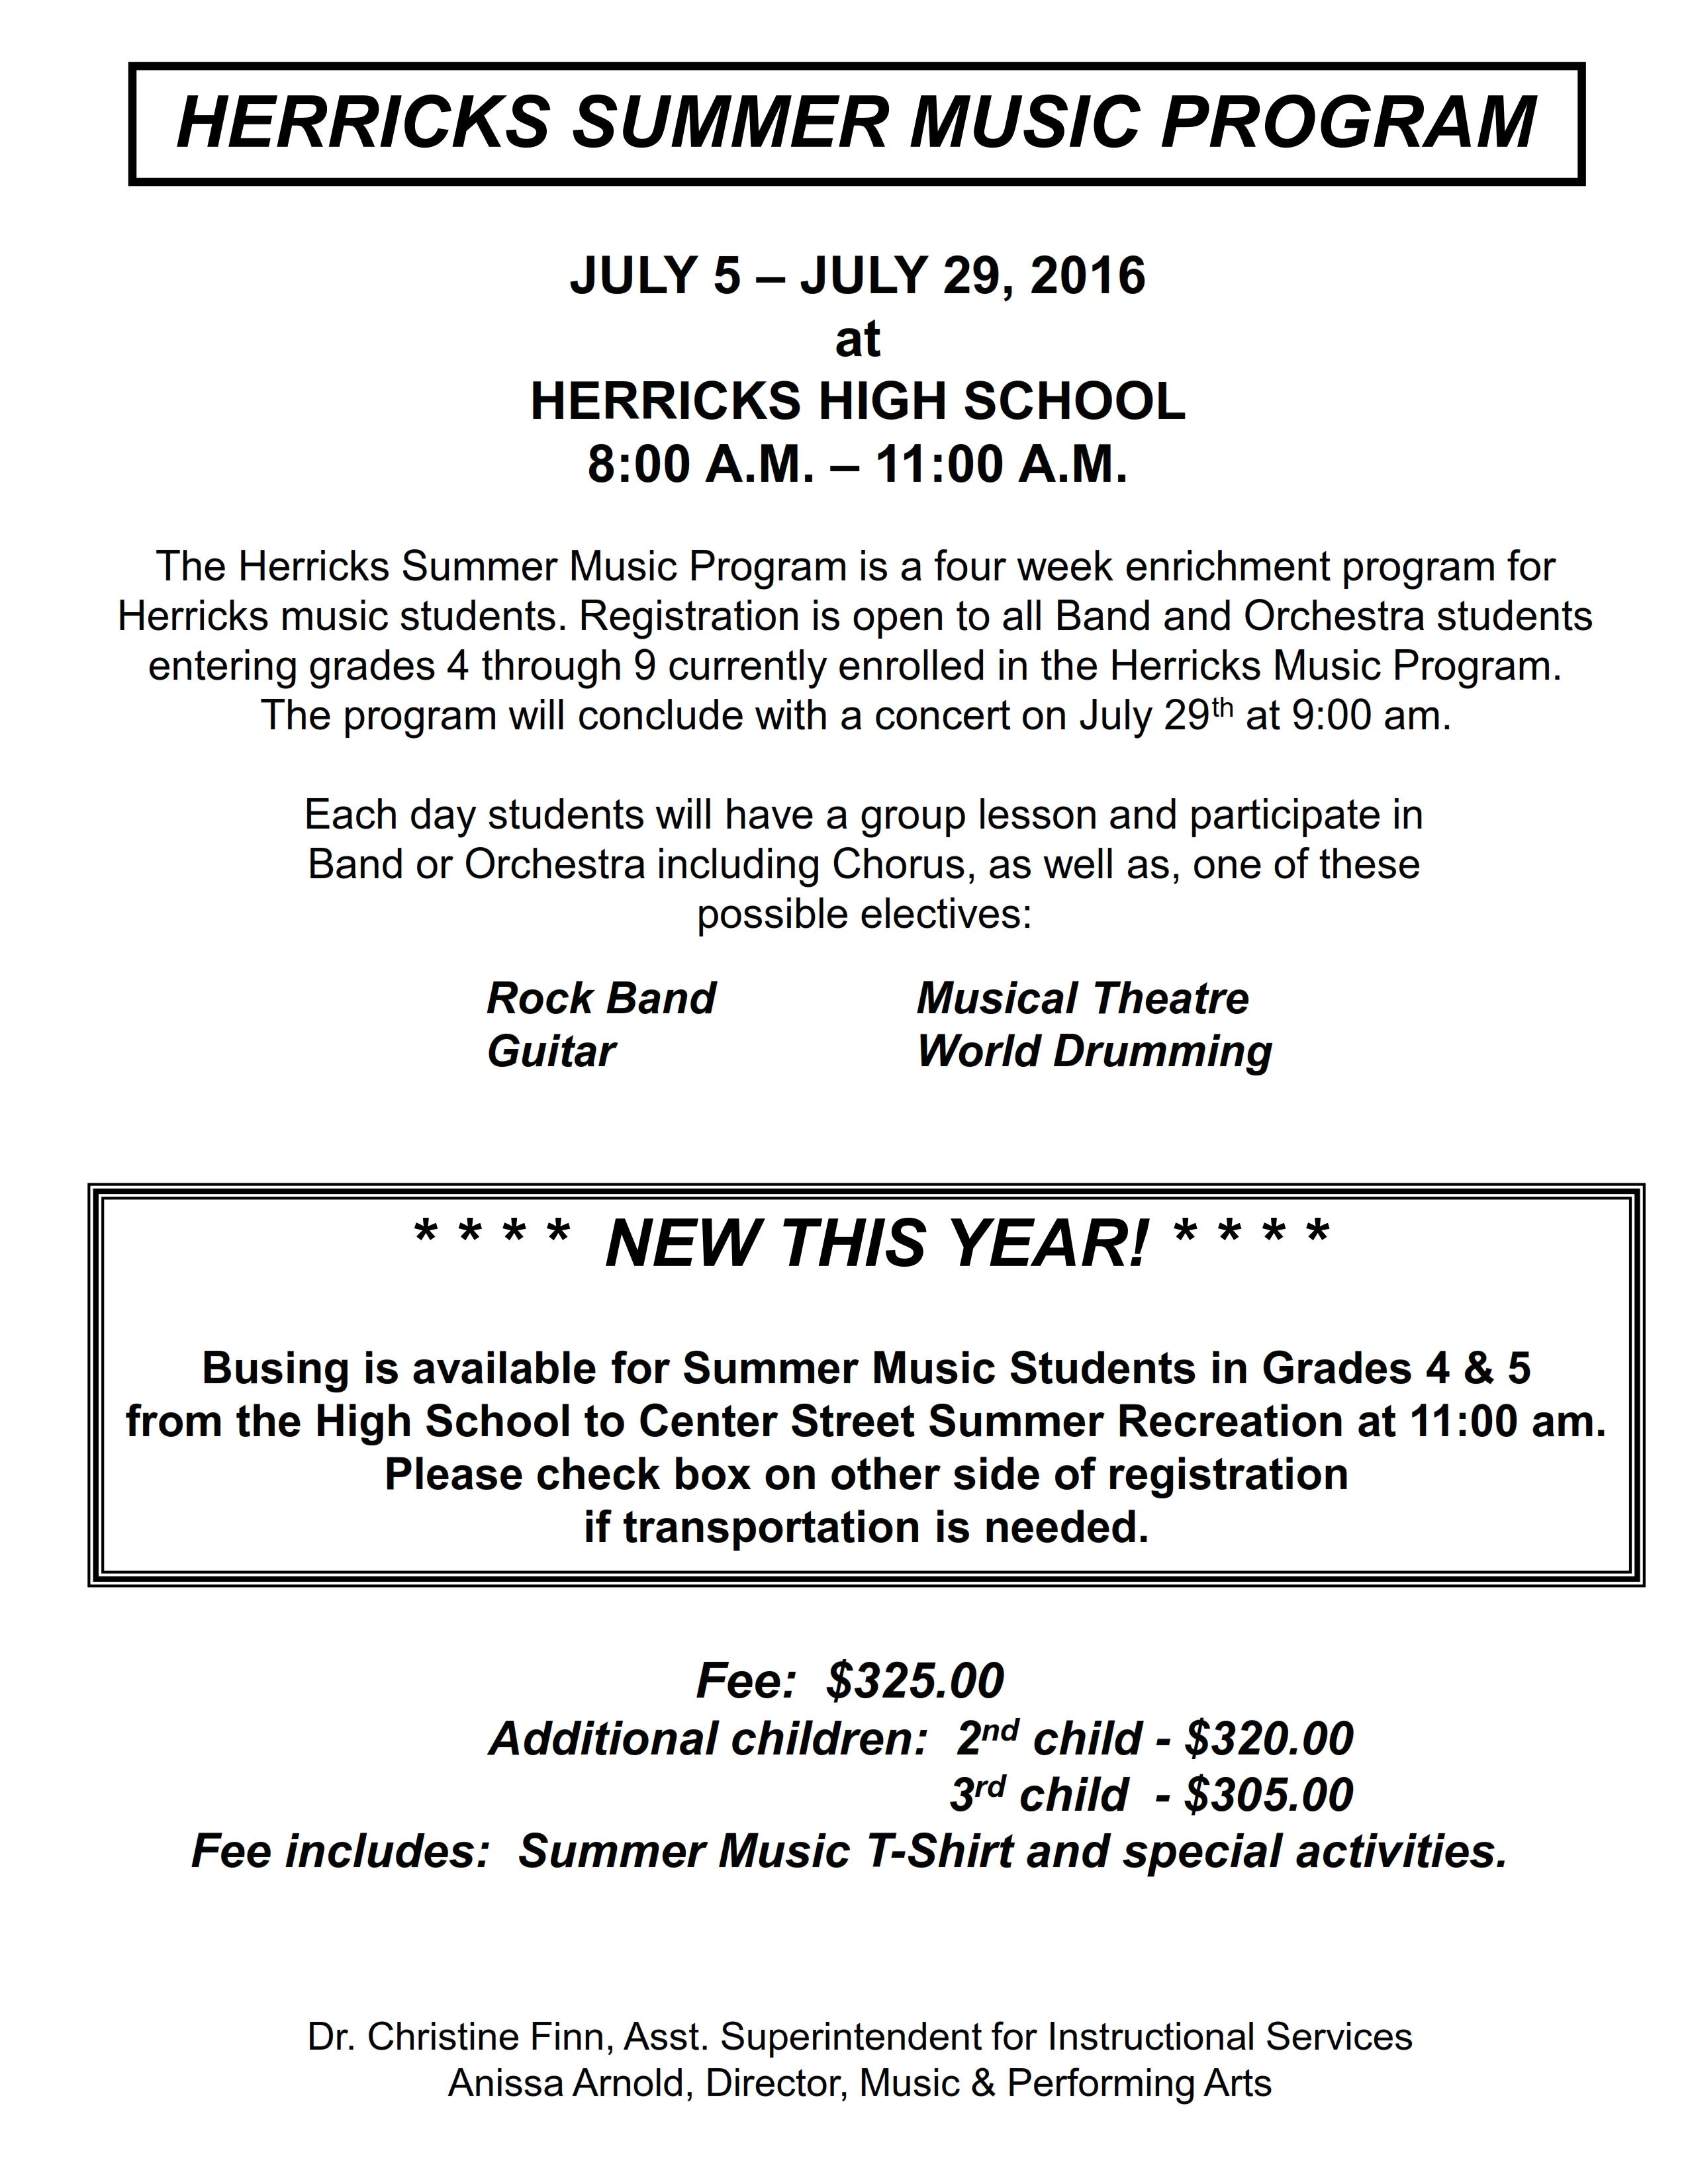 choir concert program template - Romeo.landinez.co